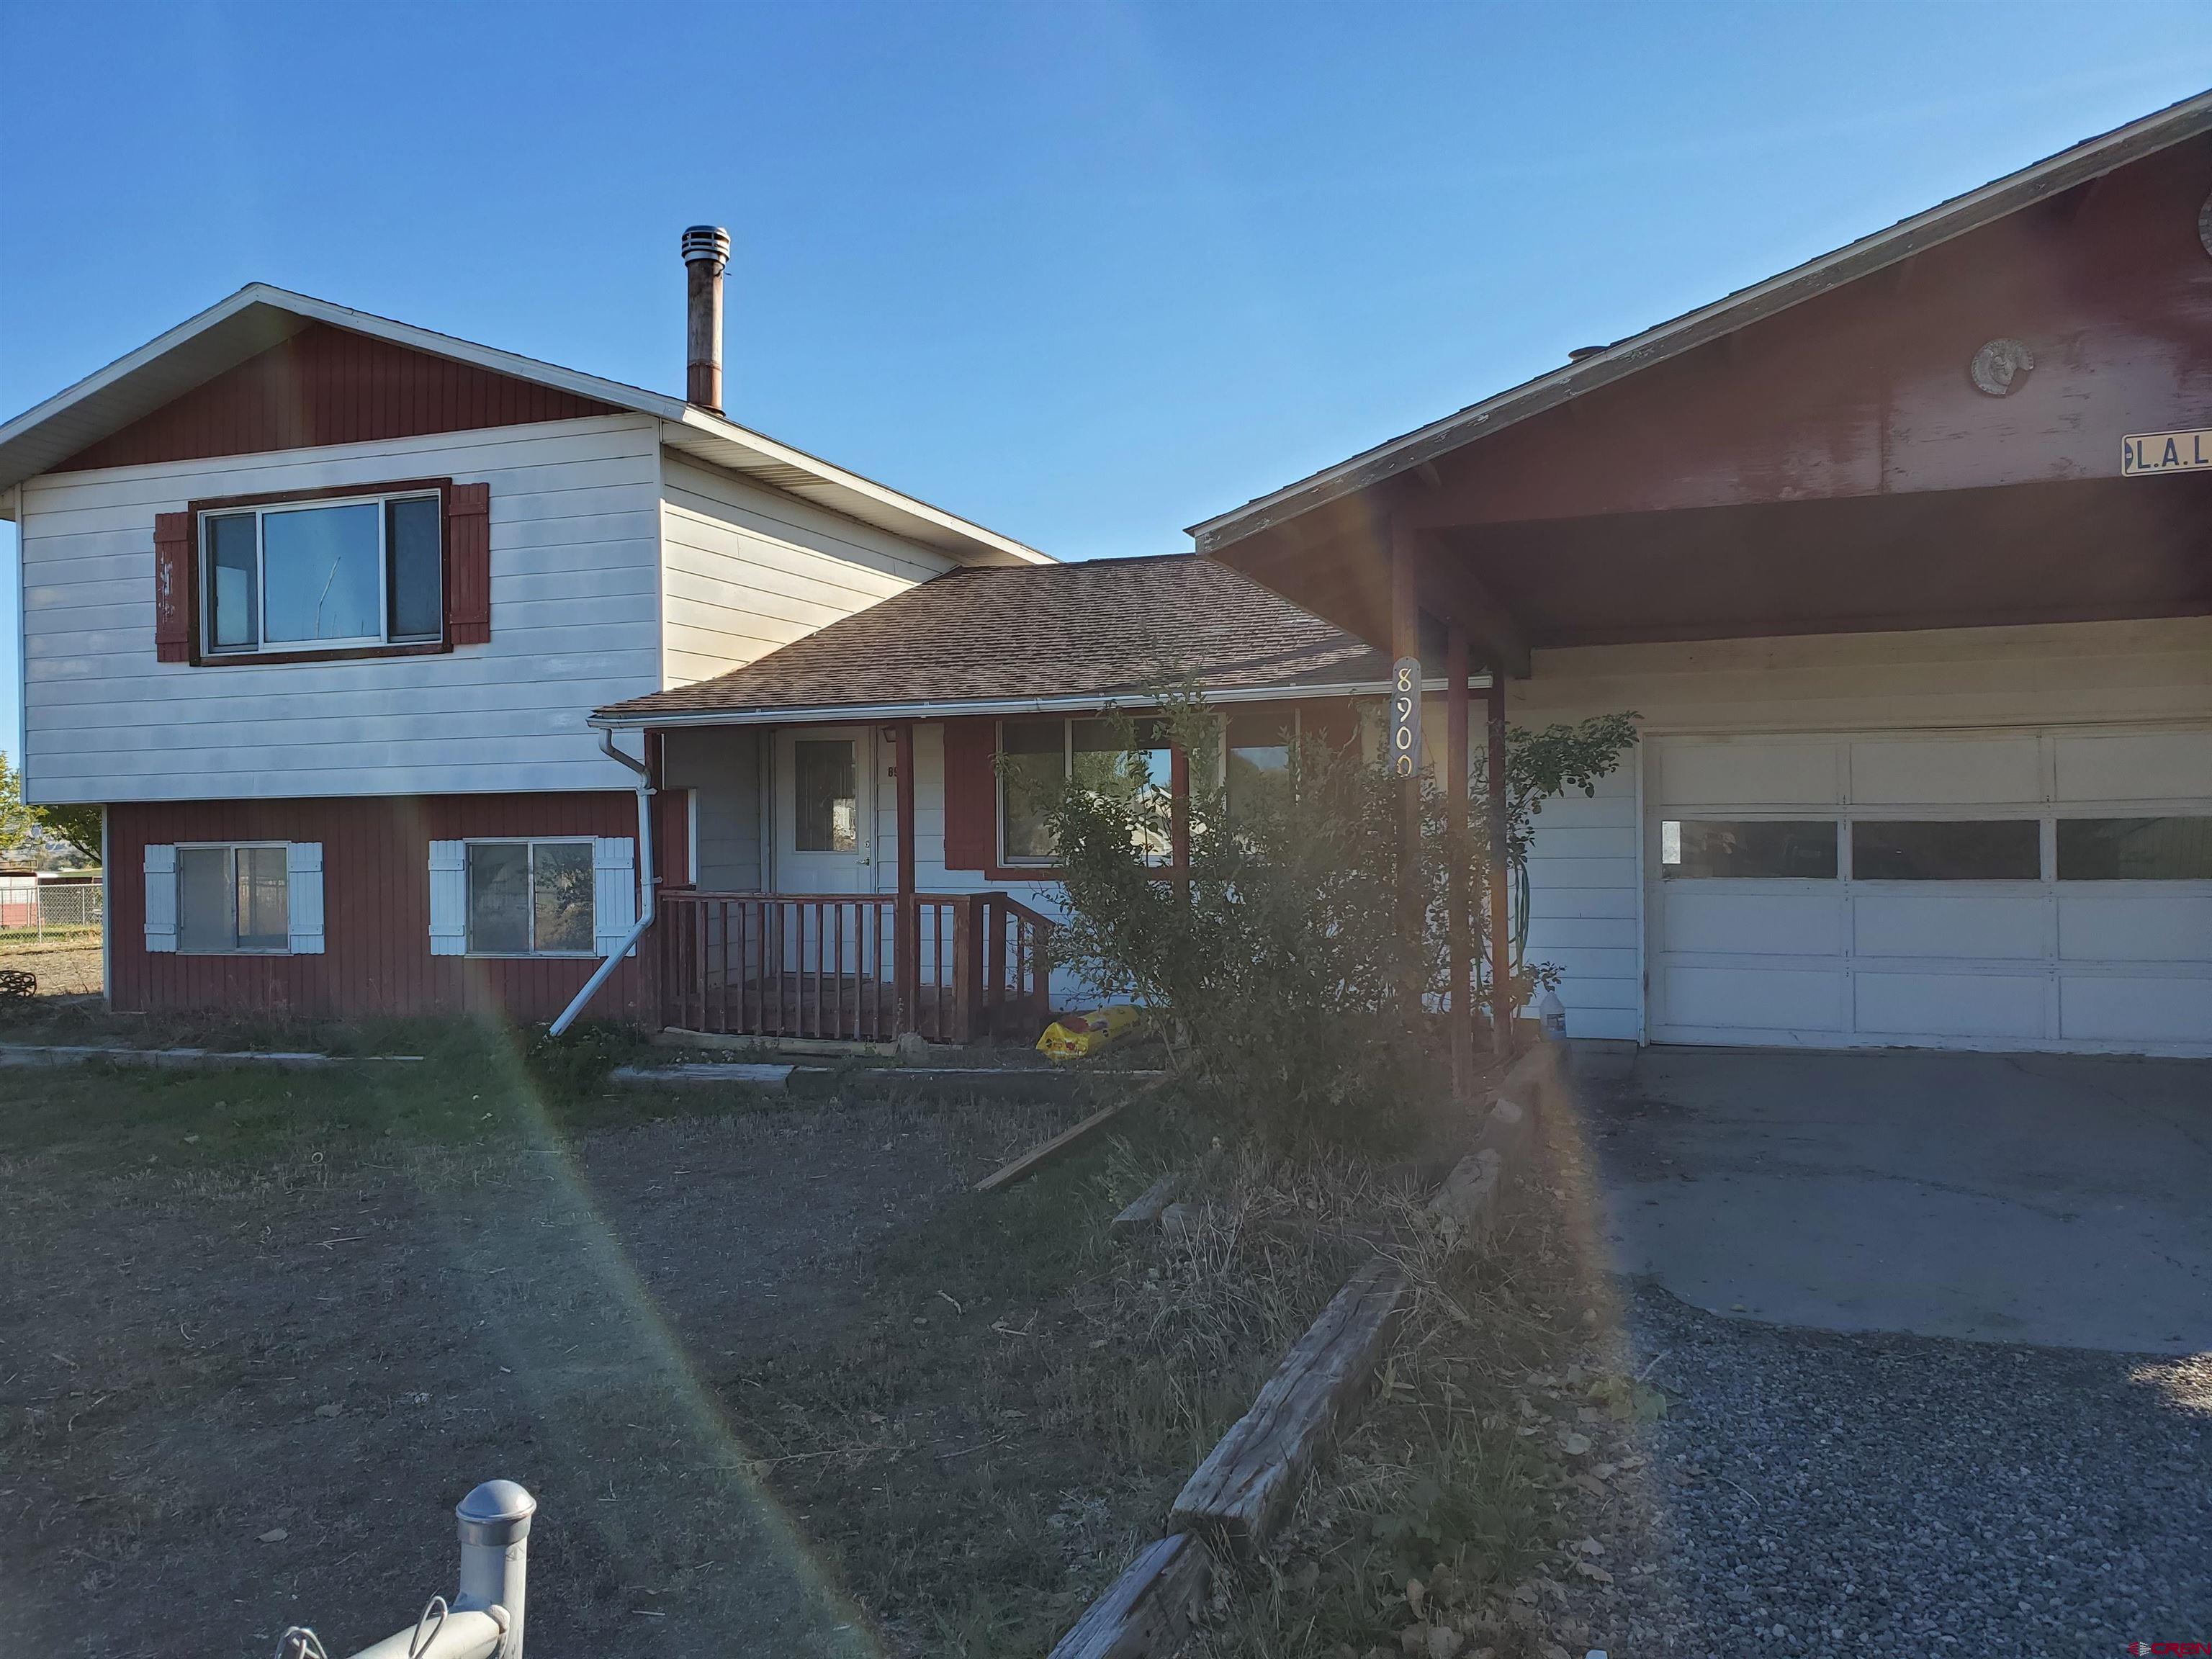 8900 6095 Road, Montrose, CO 81401